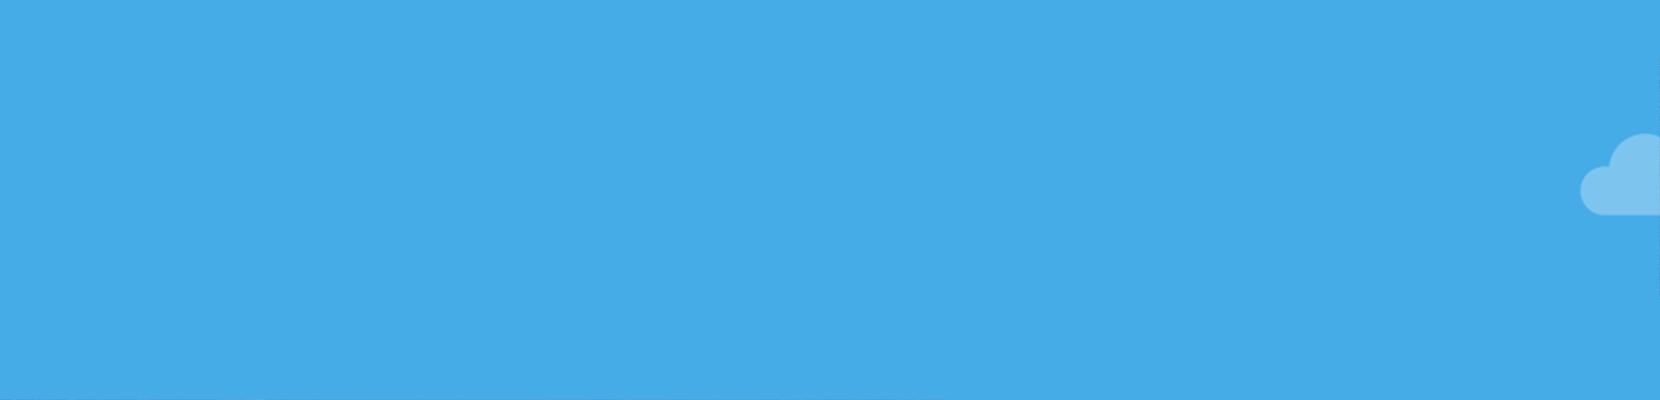 Azure Slider Background